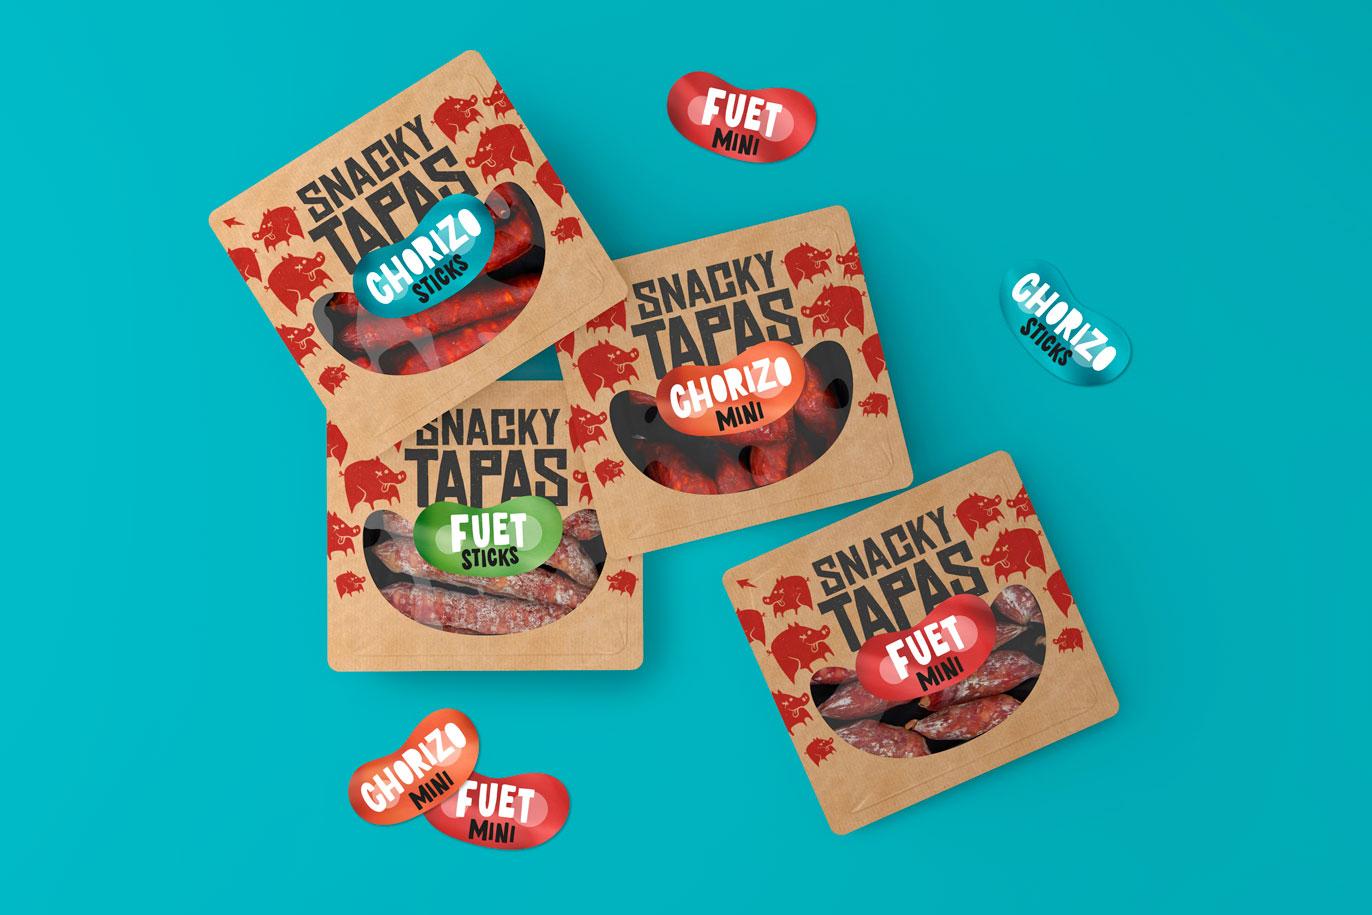 Can Calet Snacky Tapas branding naming packaging il·lustració gran consum FMCG snacks disseny gràfic Vibranding